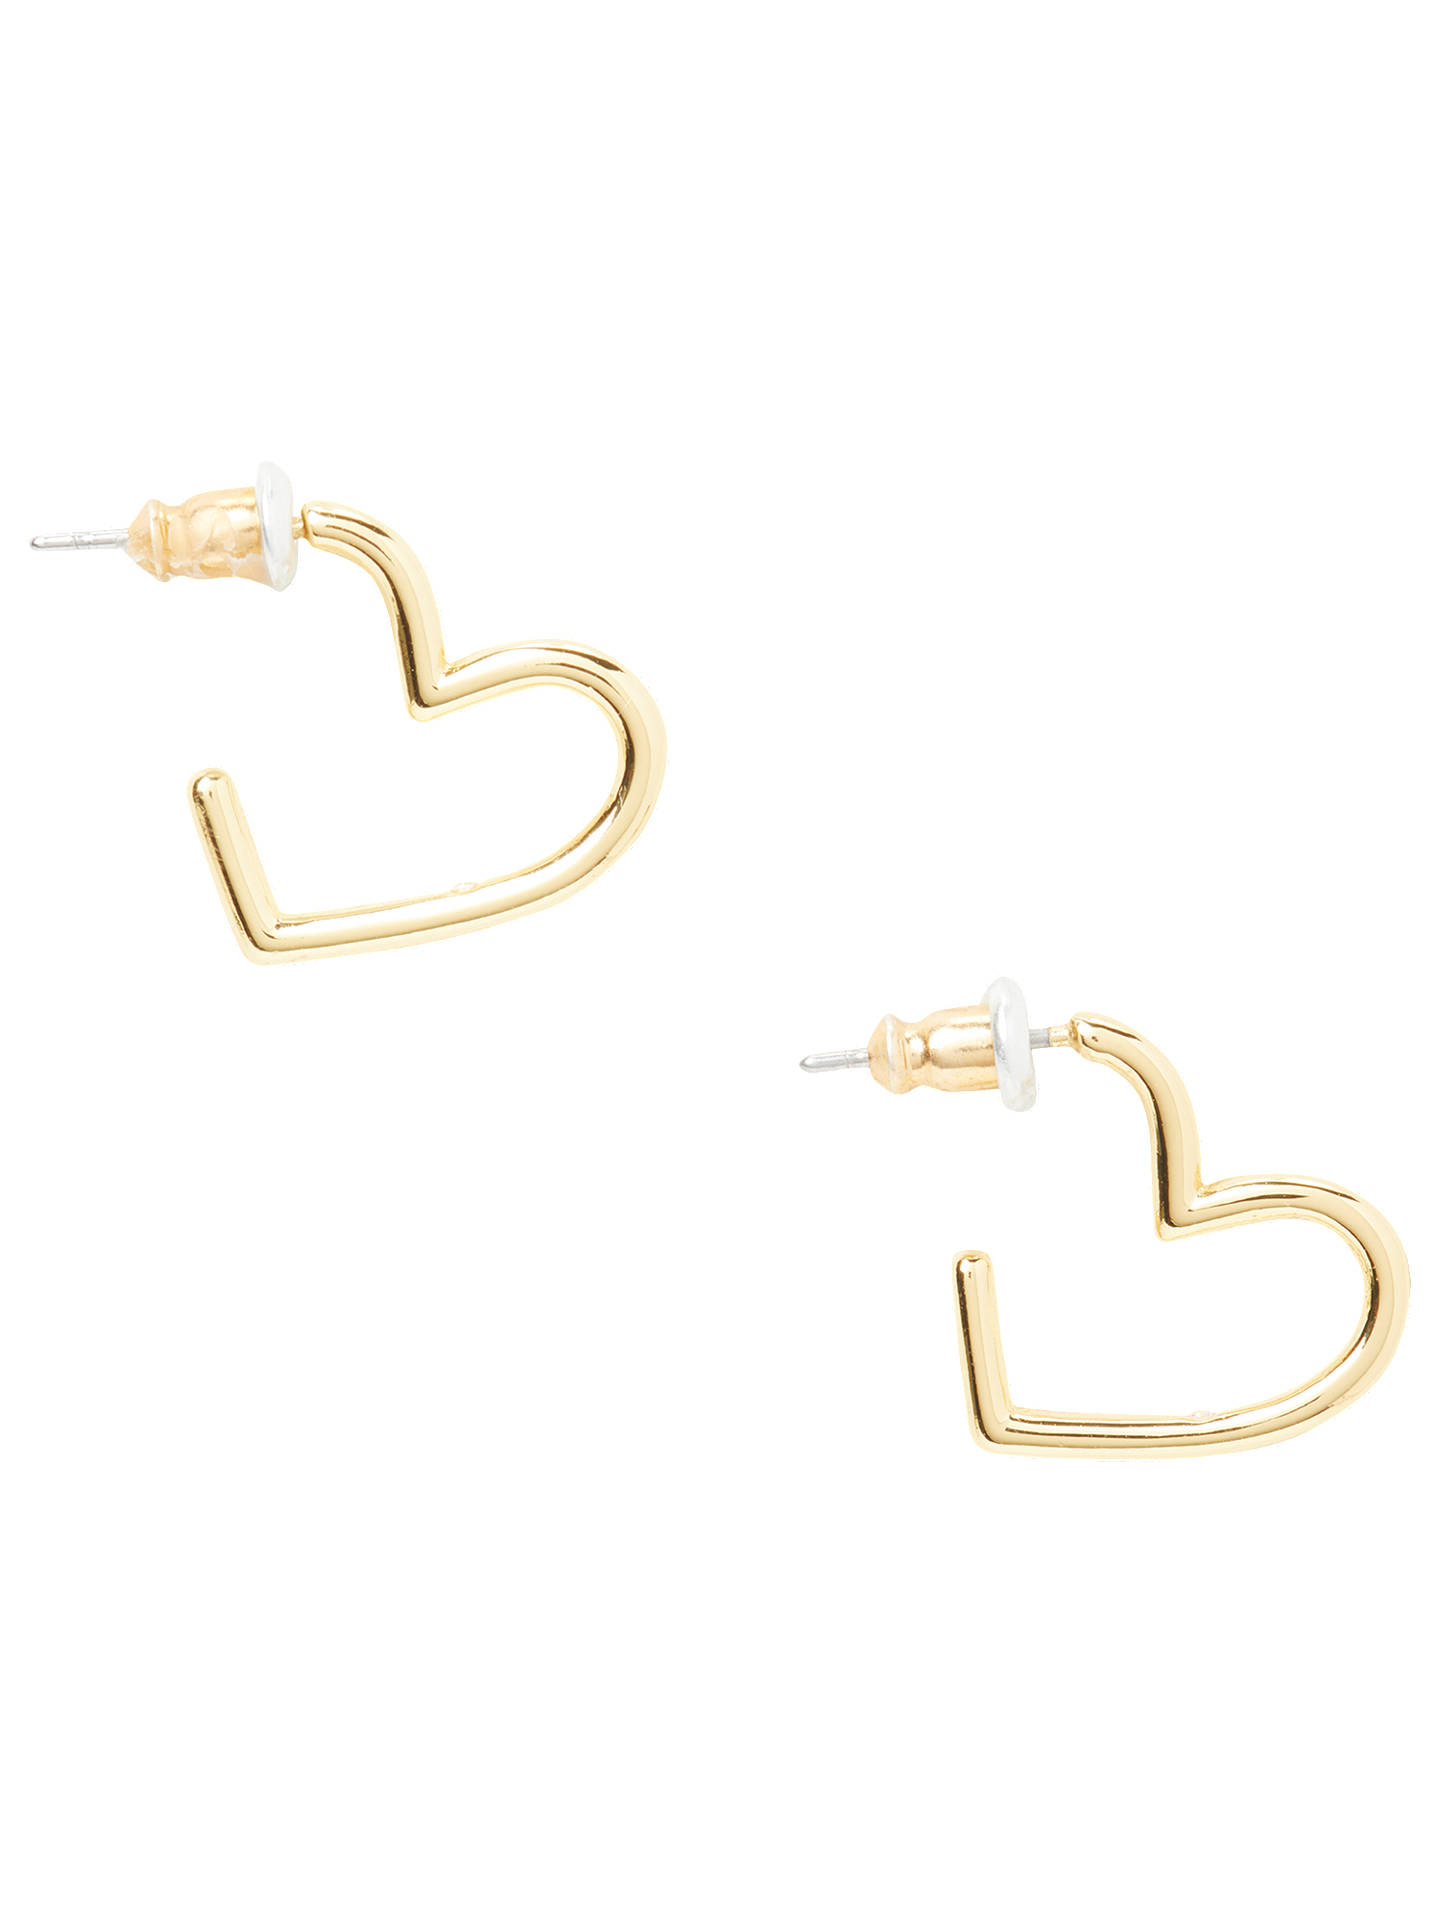 199c2527534a0 kate spade new york Mini Heart Hoop Earrings, Gold